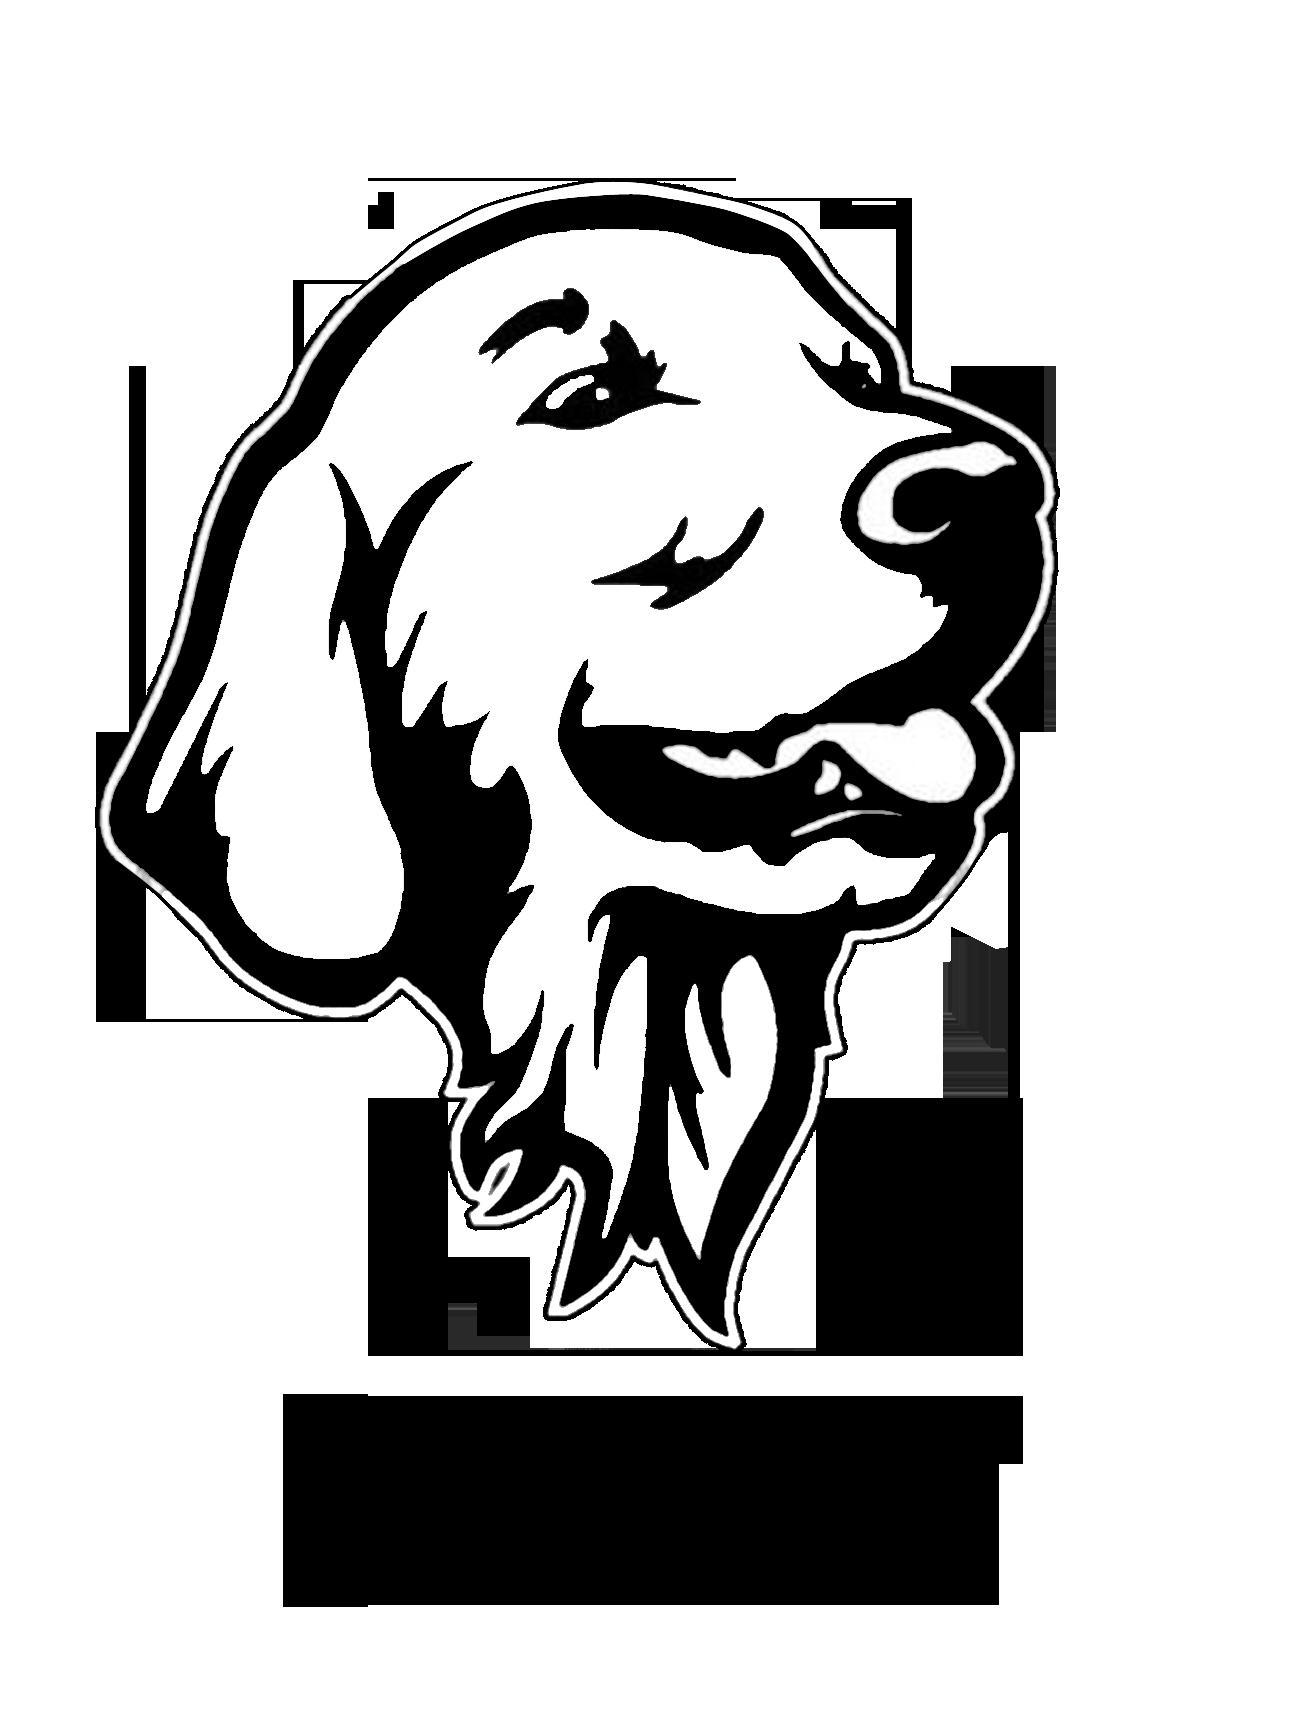 Clipart golden retriever dog clipart freeuse Personalized golden retriever decal/sticker clipart freeuse